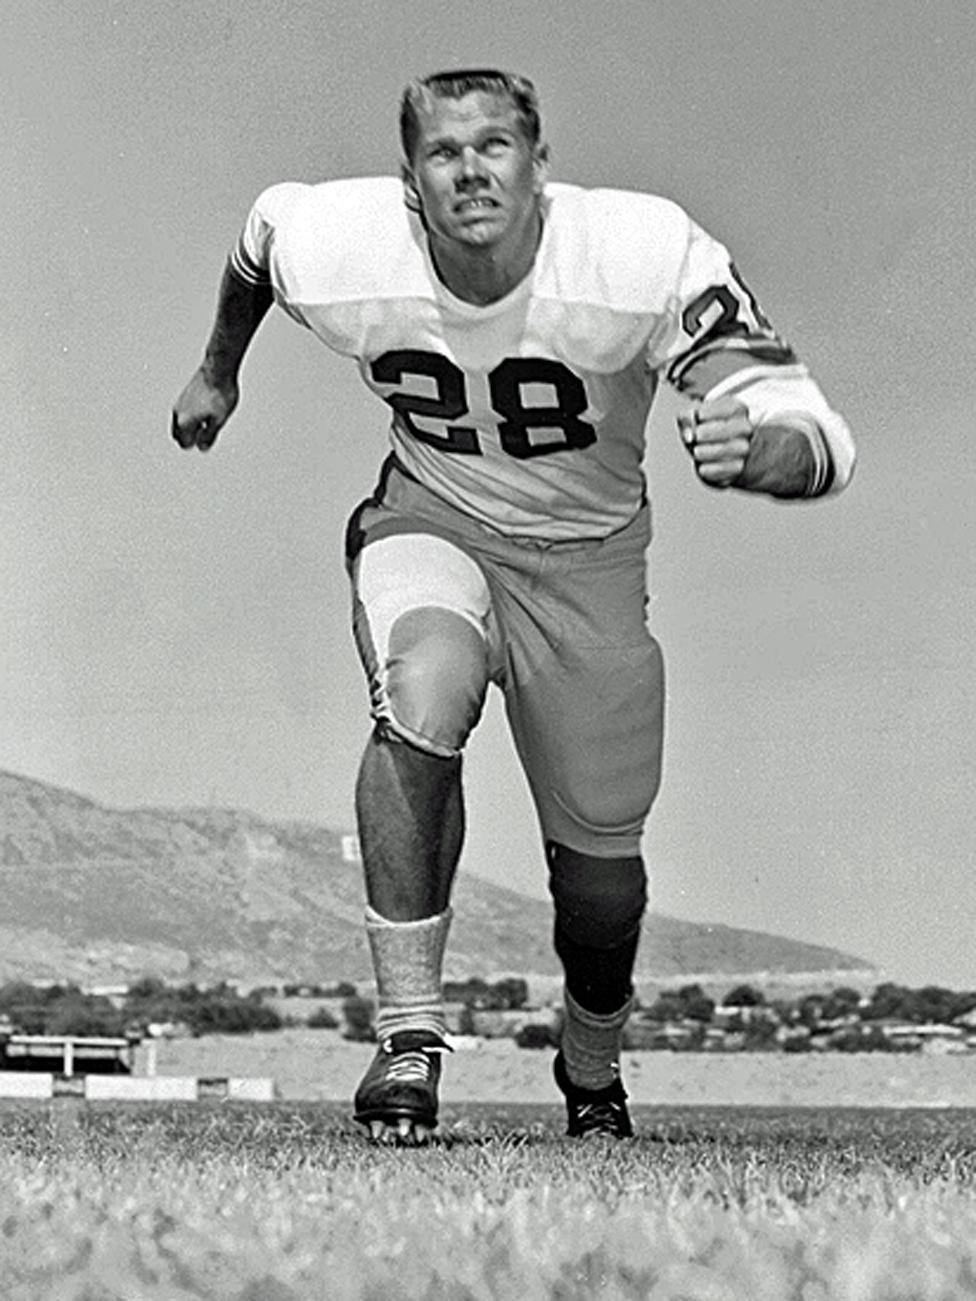 John Corcoran cuando era un joven atleta